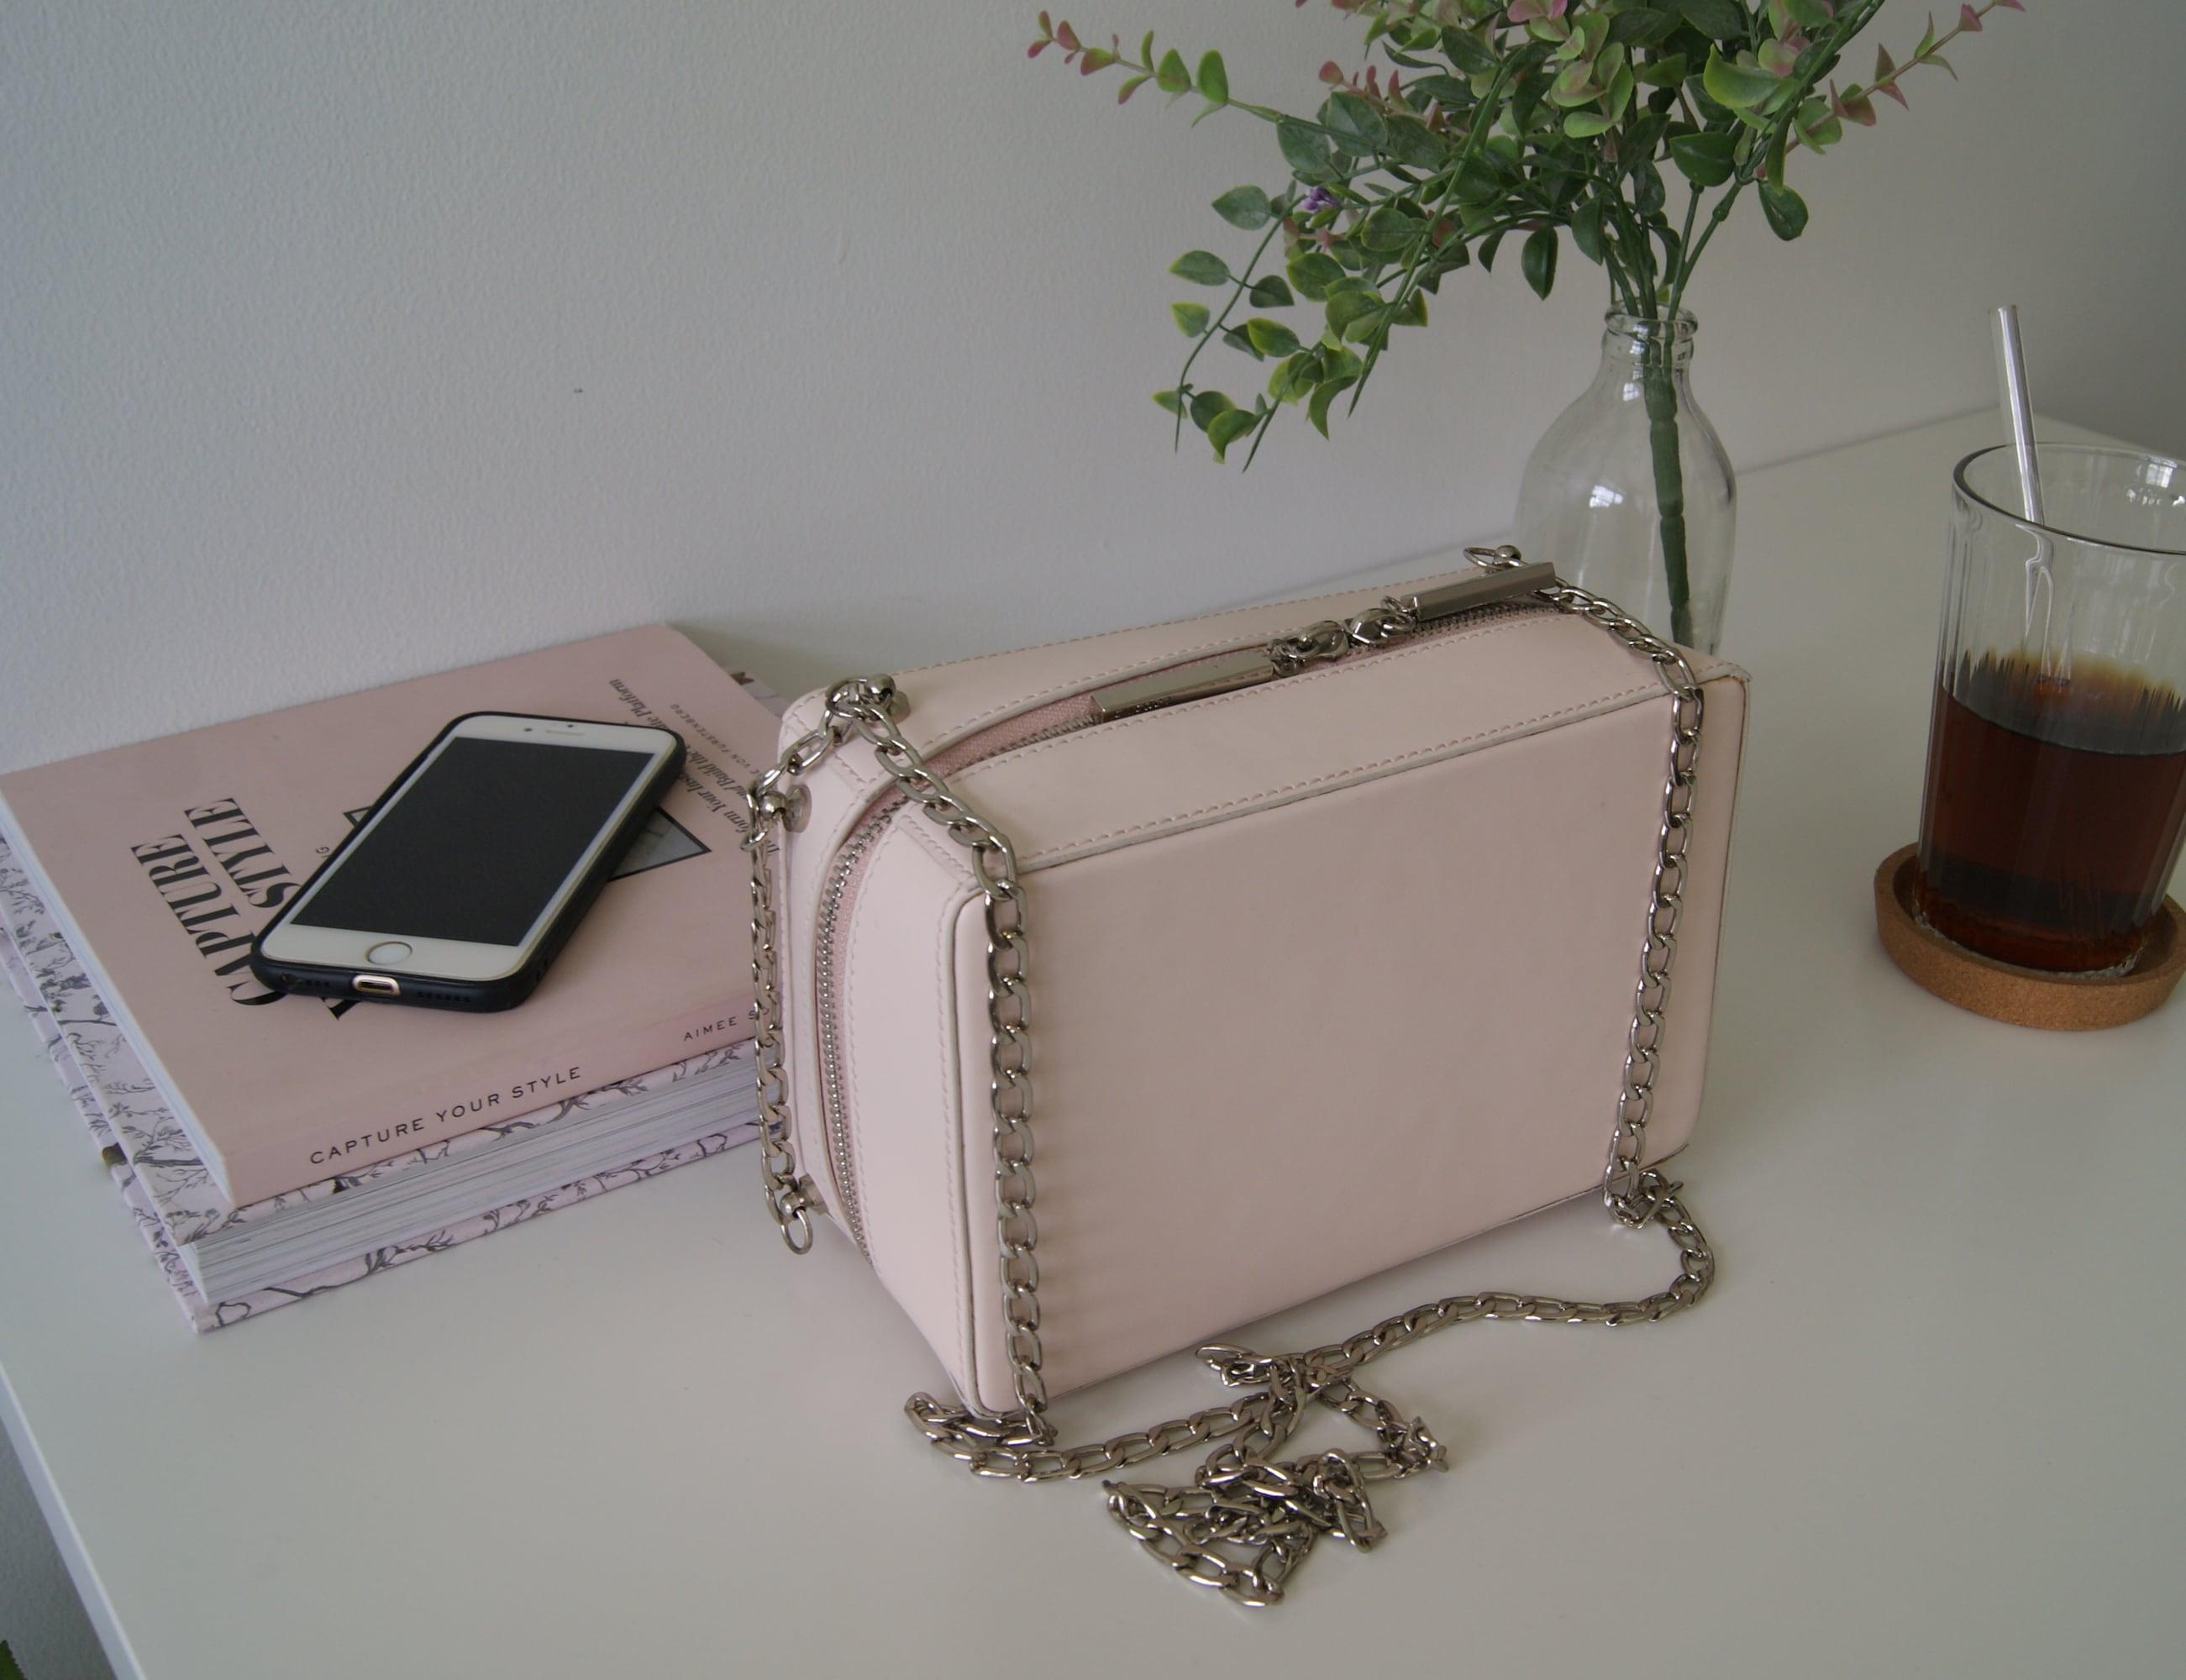 EMERGE Tumble 3-in-1 Minimal Leather Bag